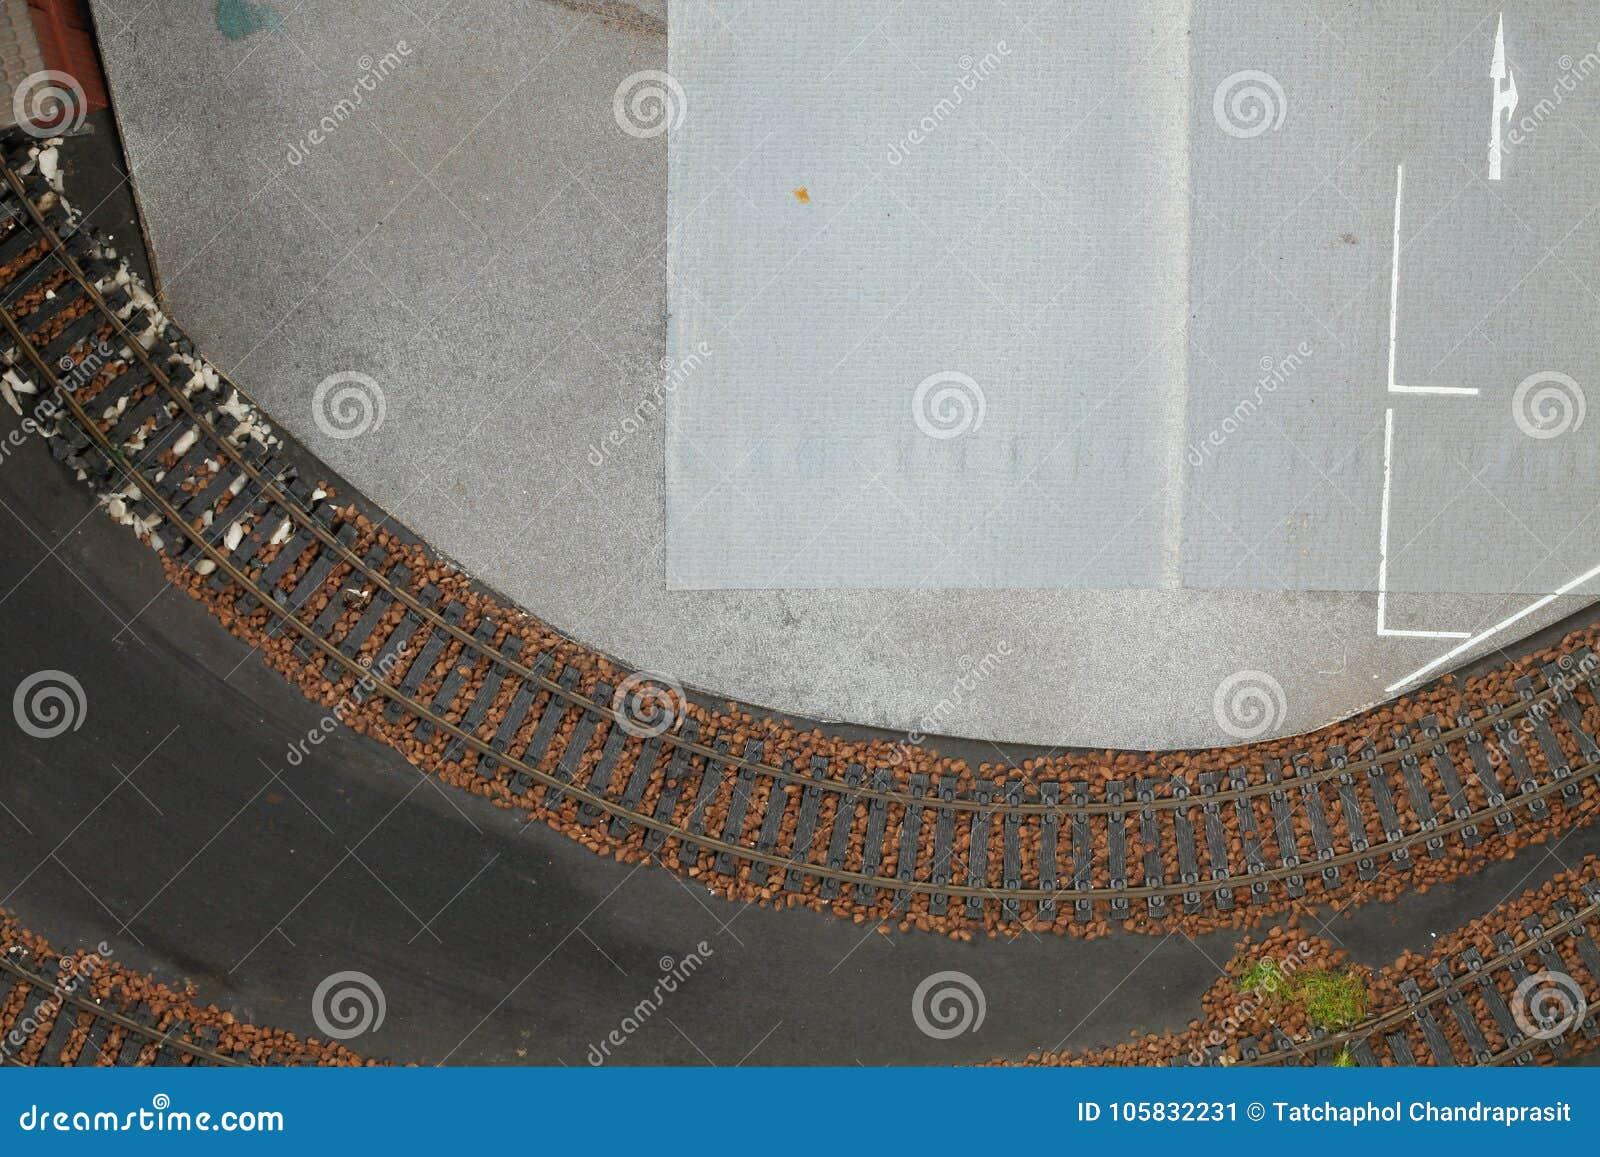 Estrada de ferro modelo na cena modelo diminuta